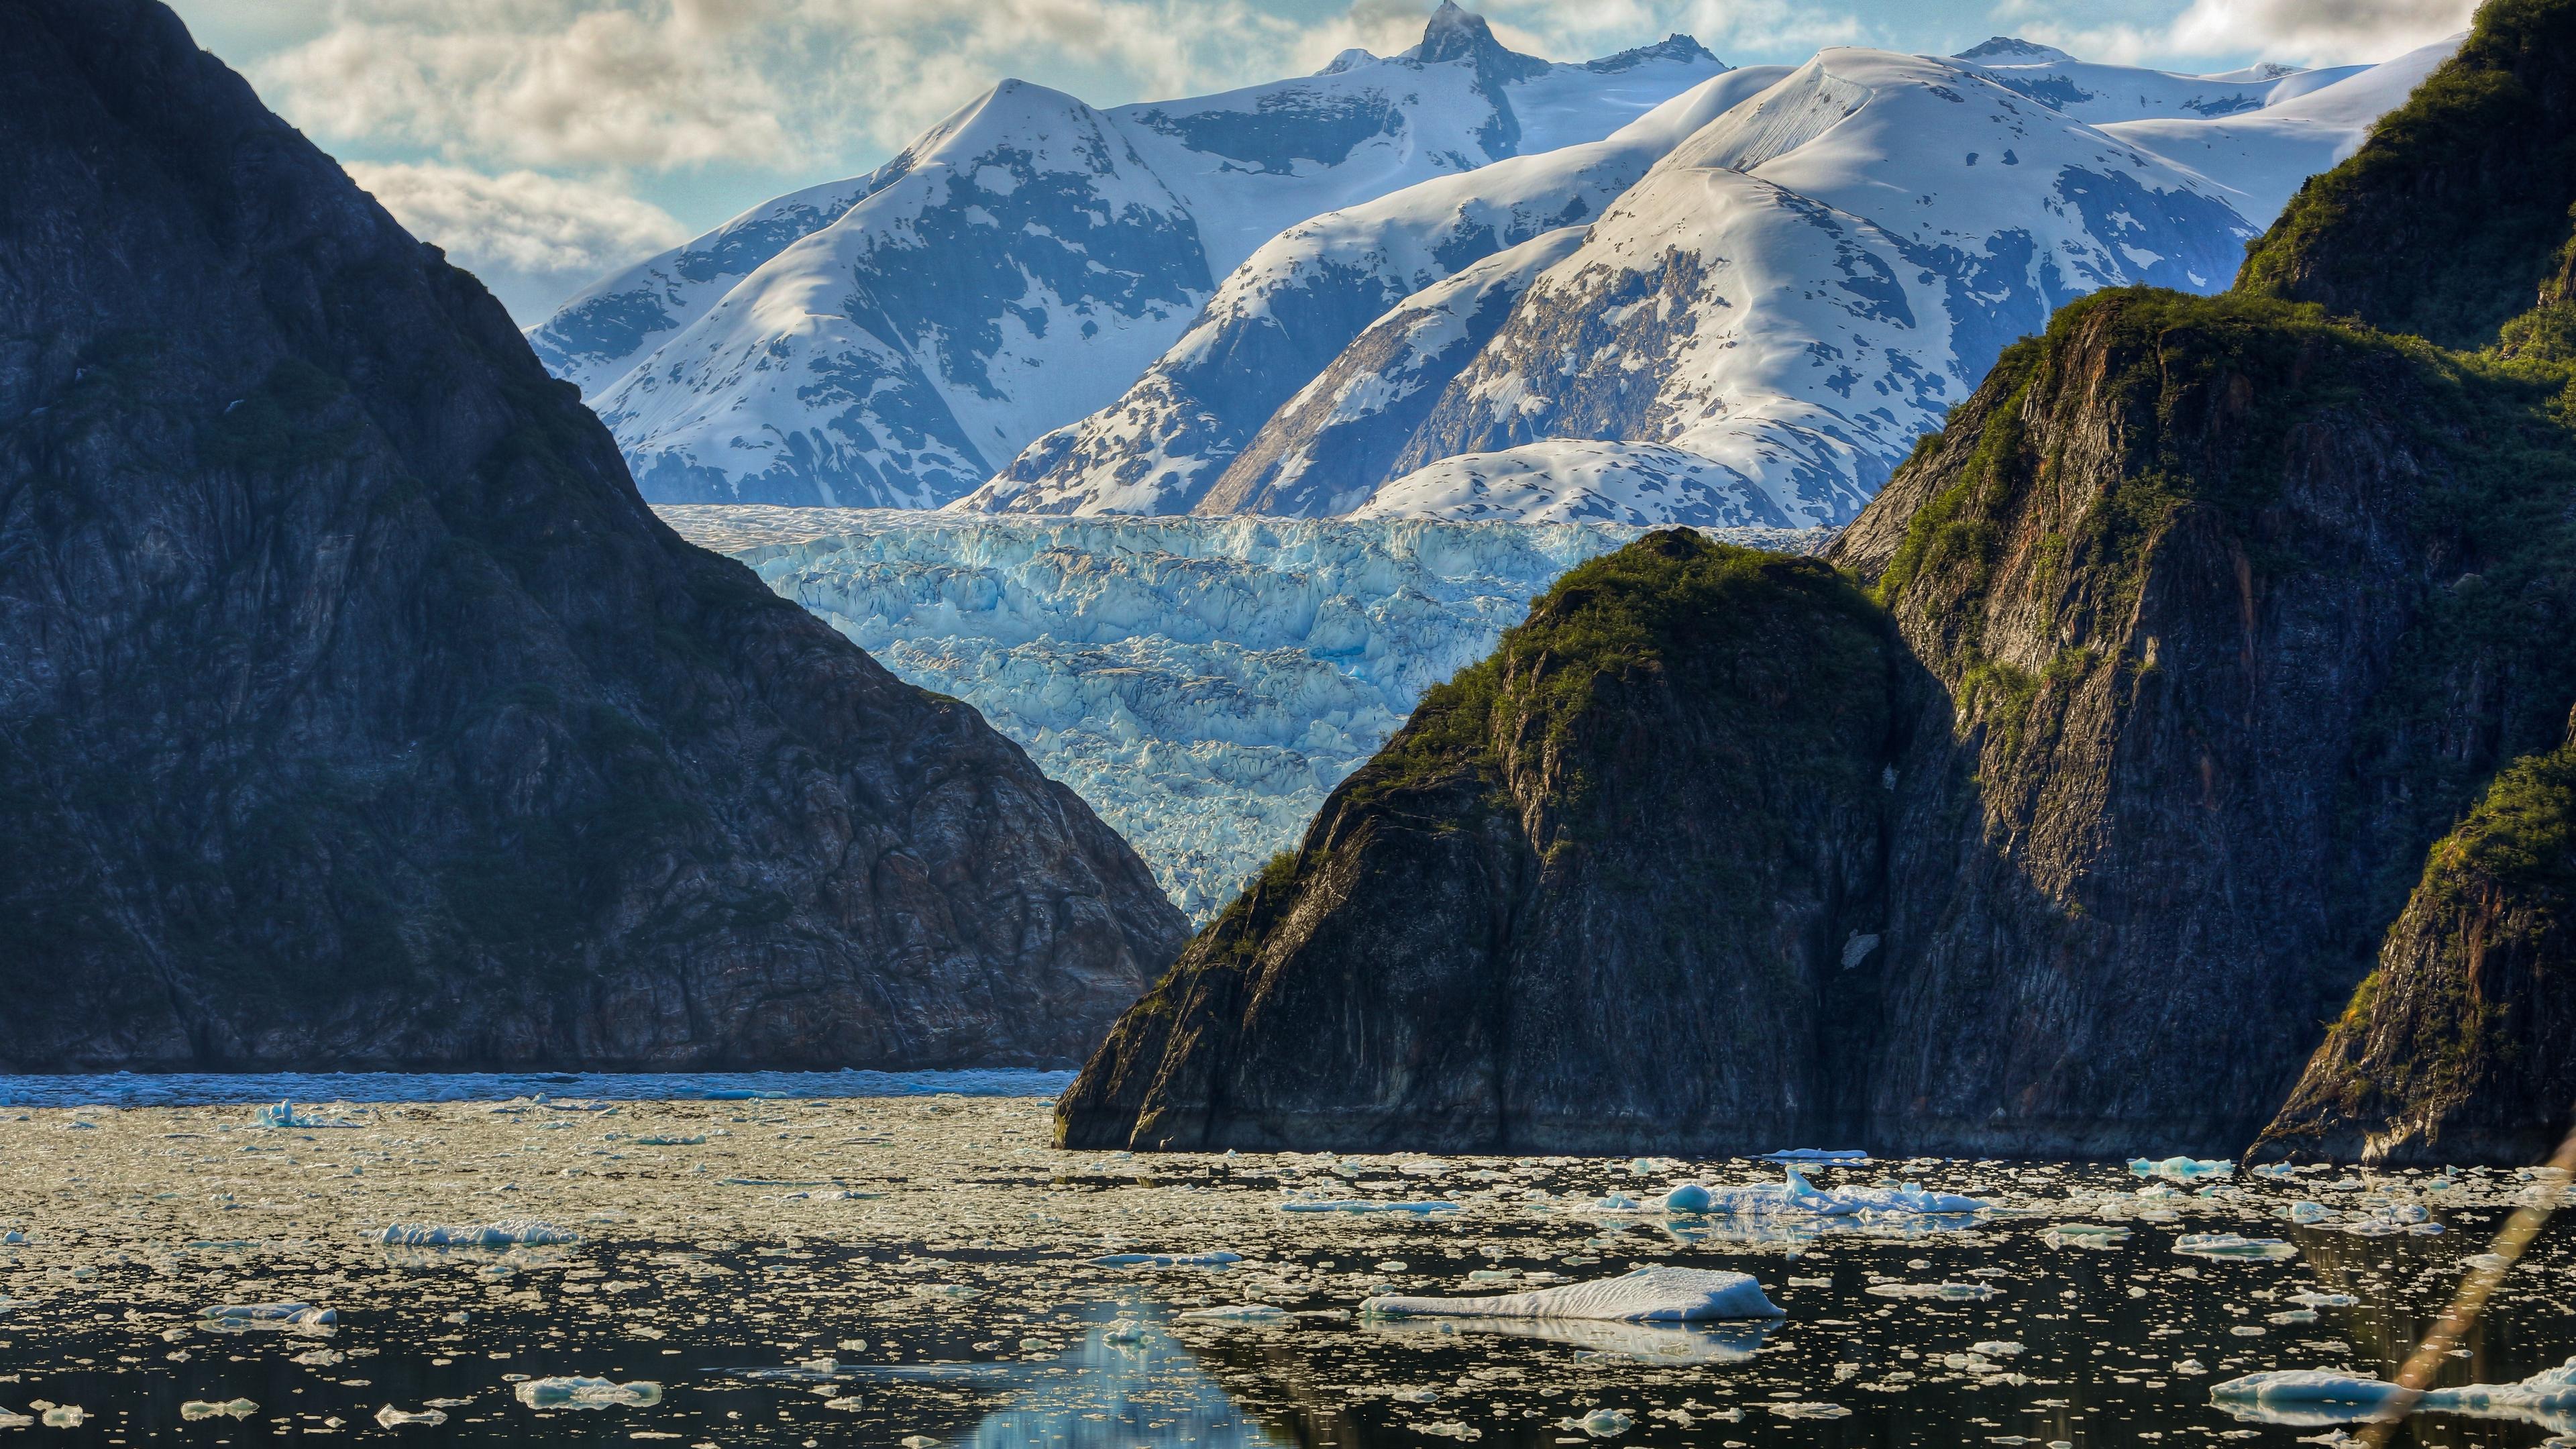 mountain sea glacier 4k 1541117885 - mountain, sea, glacier 4k - Sea, Mountain, Glacier